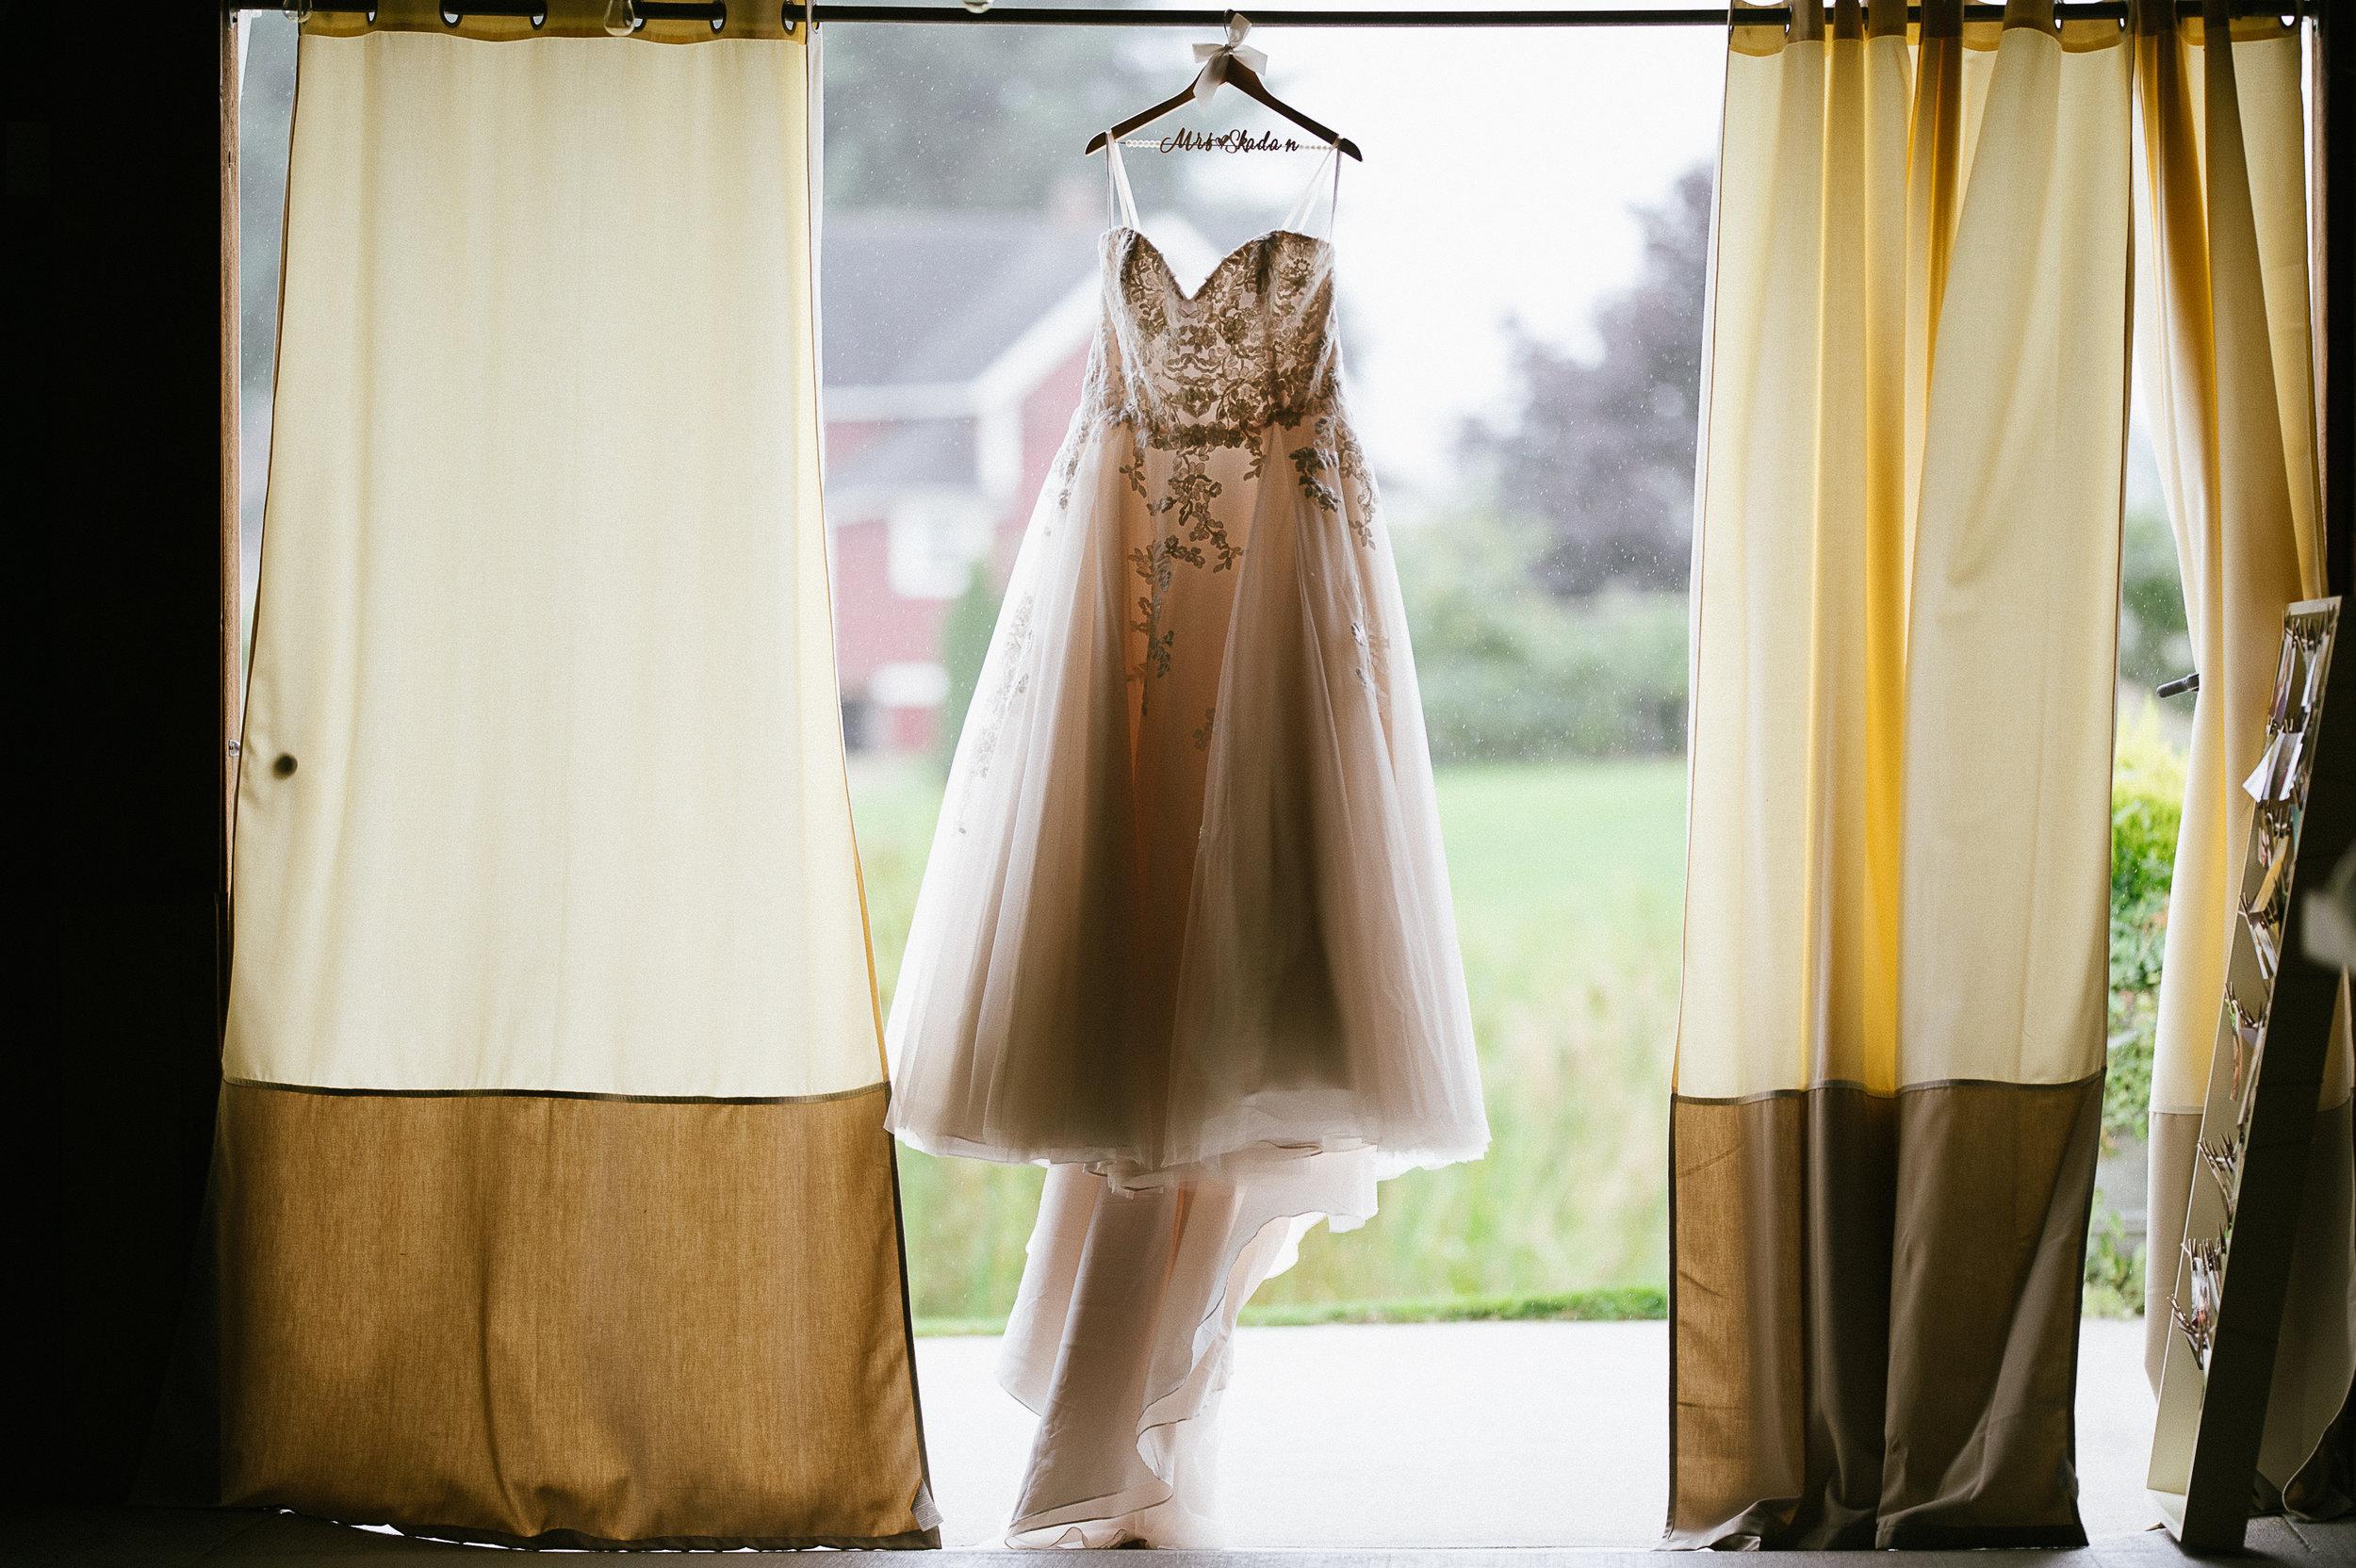 Swan Trail Farm Wedding_Sarah Schurman + Brian Skadan_Snohomish Wedding_Kelsey Lane Photography-5560.jpg